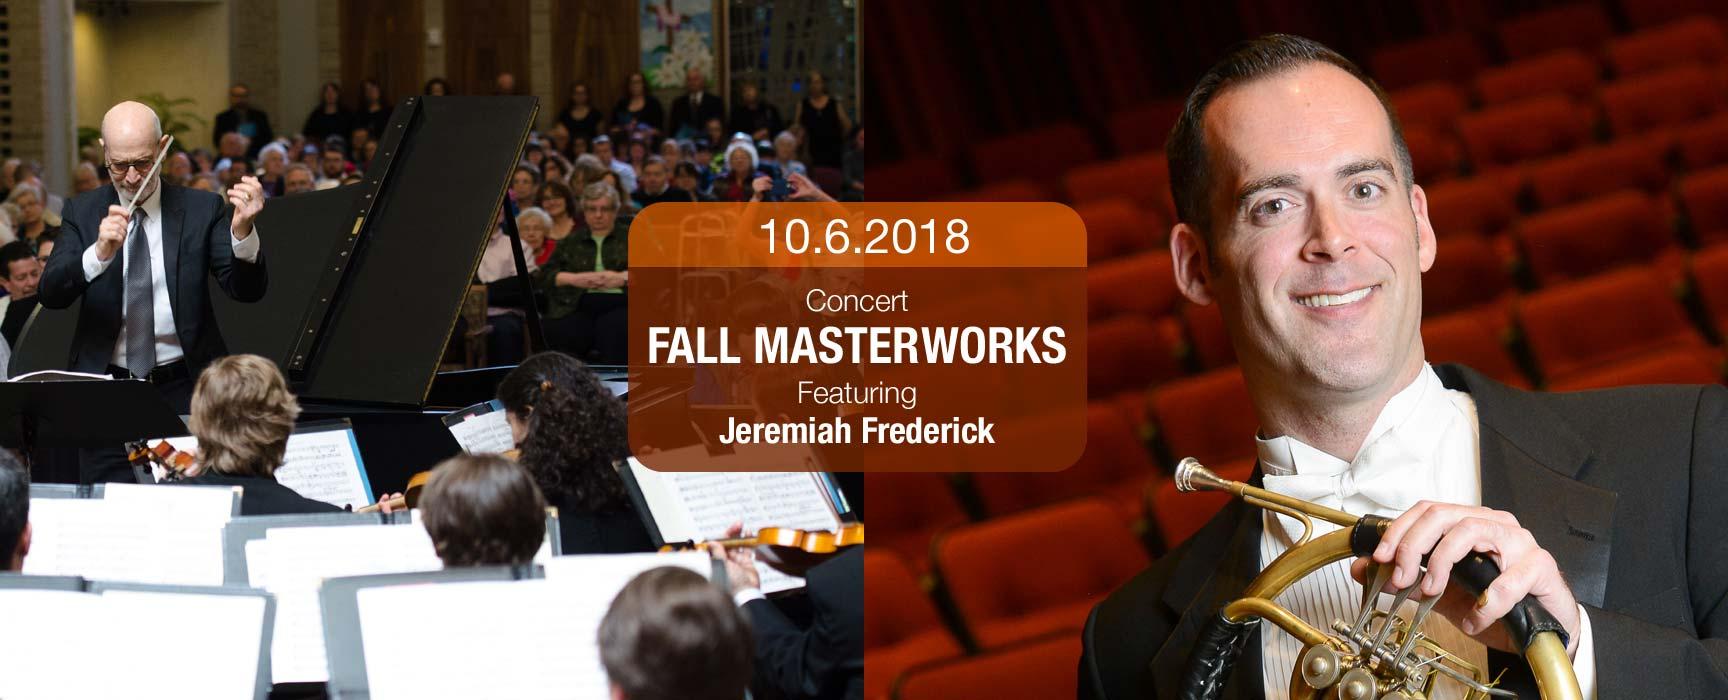 2018 Fall Masterworks Concert